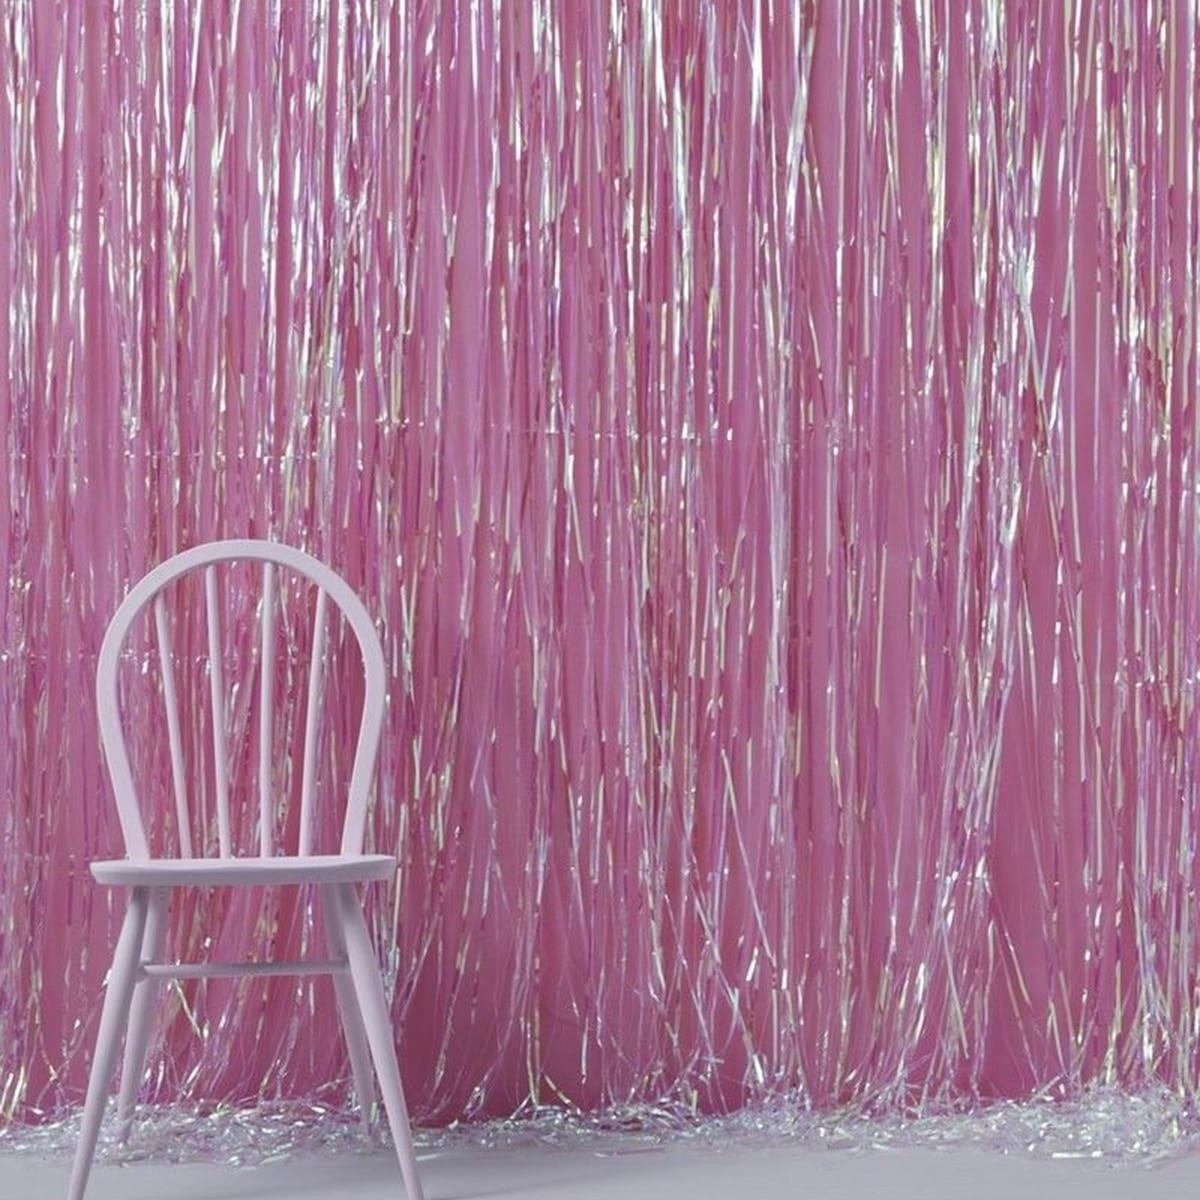 Metallic Fringe Foil Shiny Curtain Party Tinsel Photography Backdrop